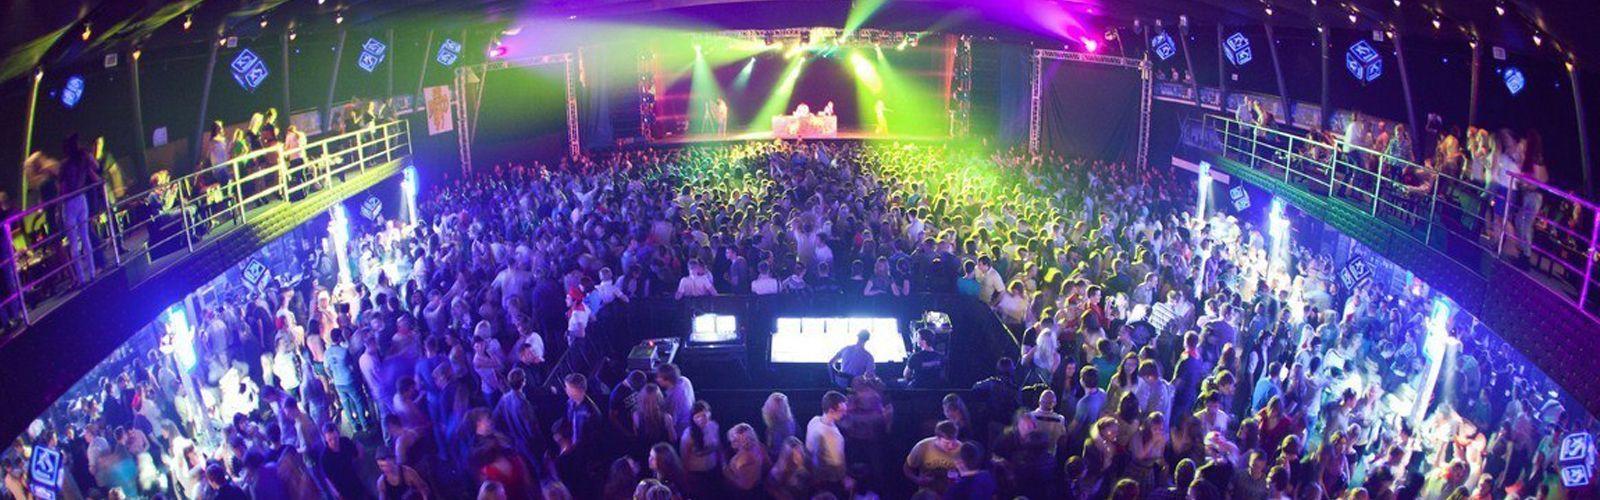 Ночные клубы екатеринбурга музыка 90 караоке клубы москвы с кабинками цены